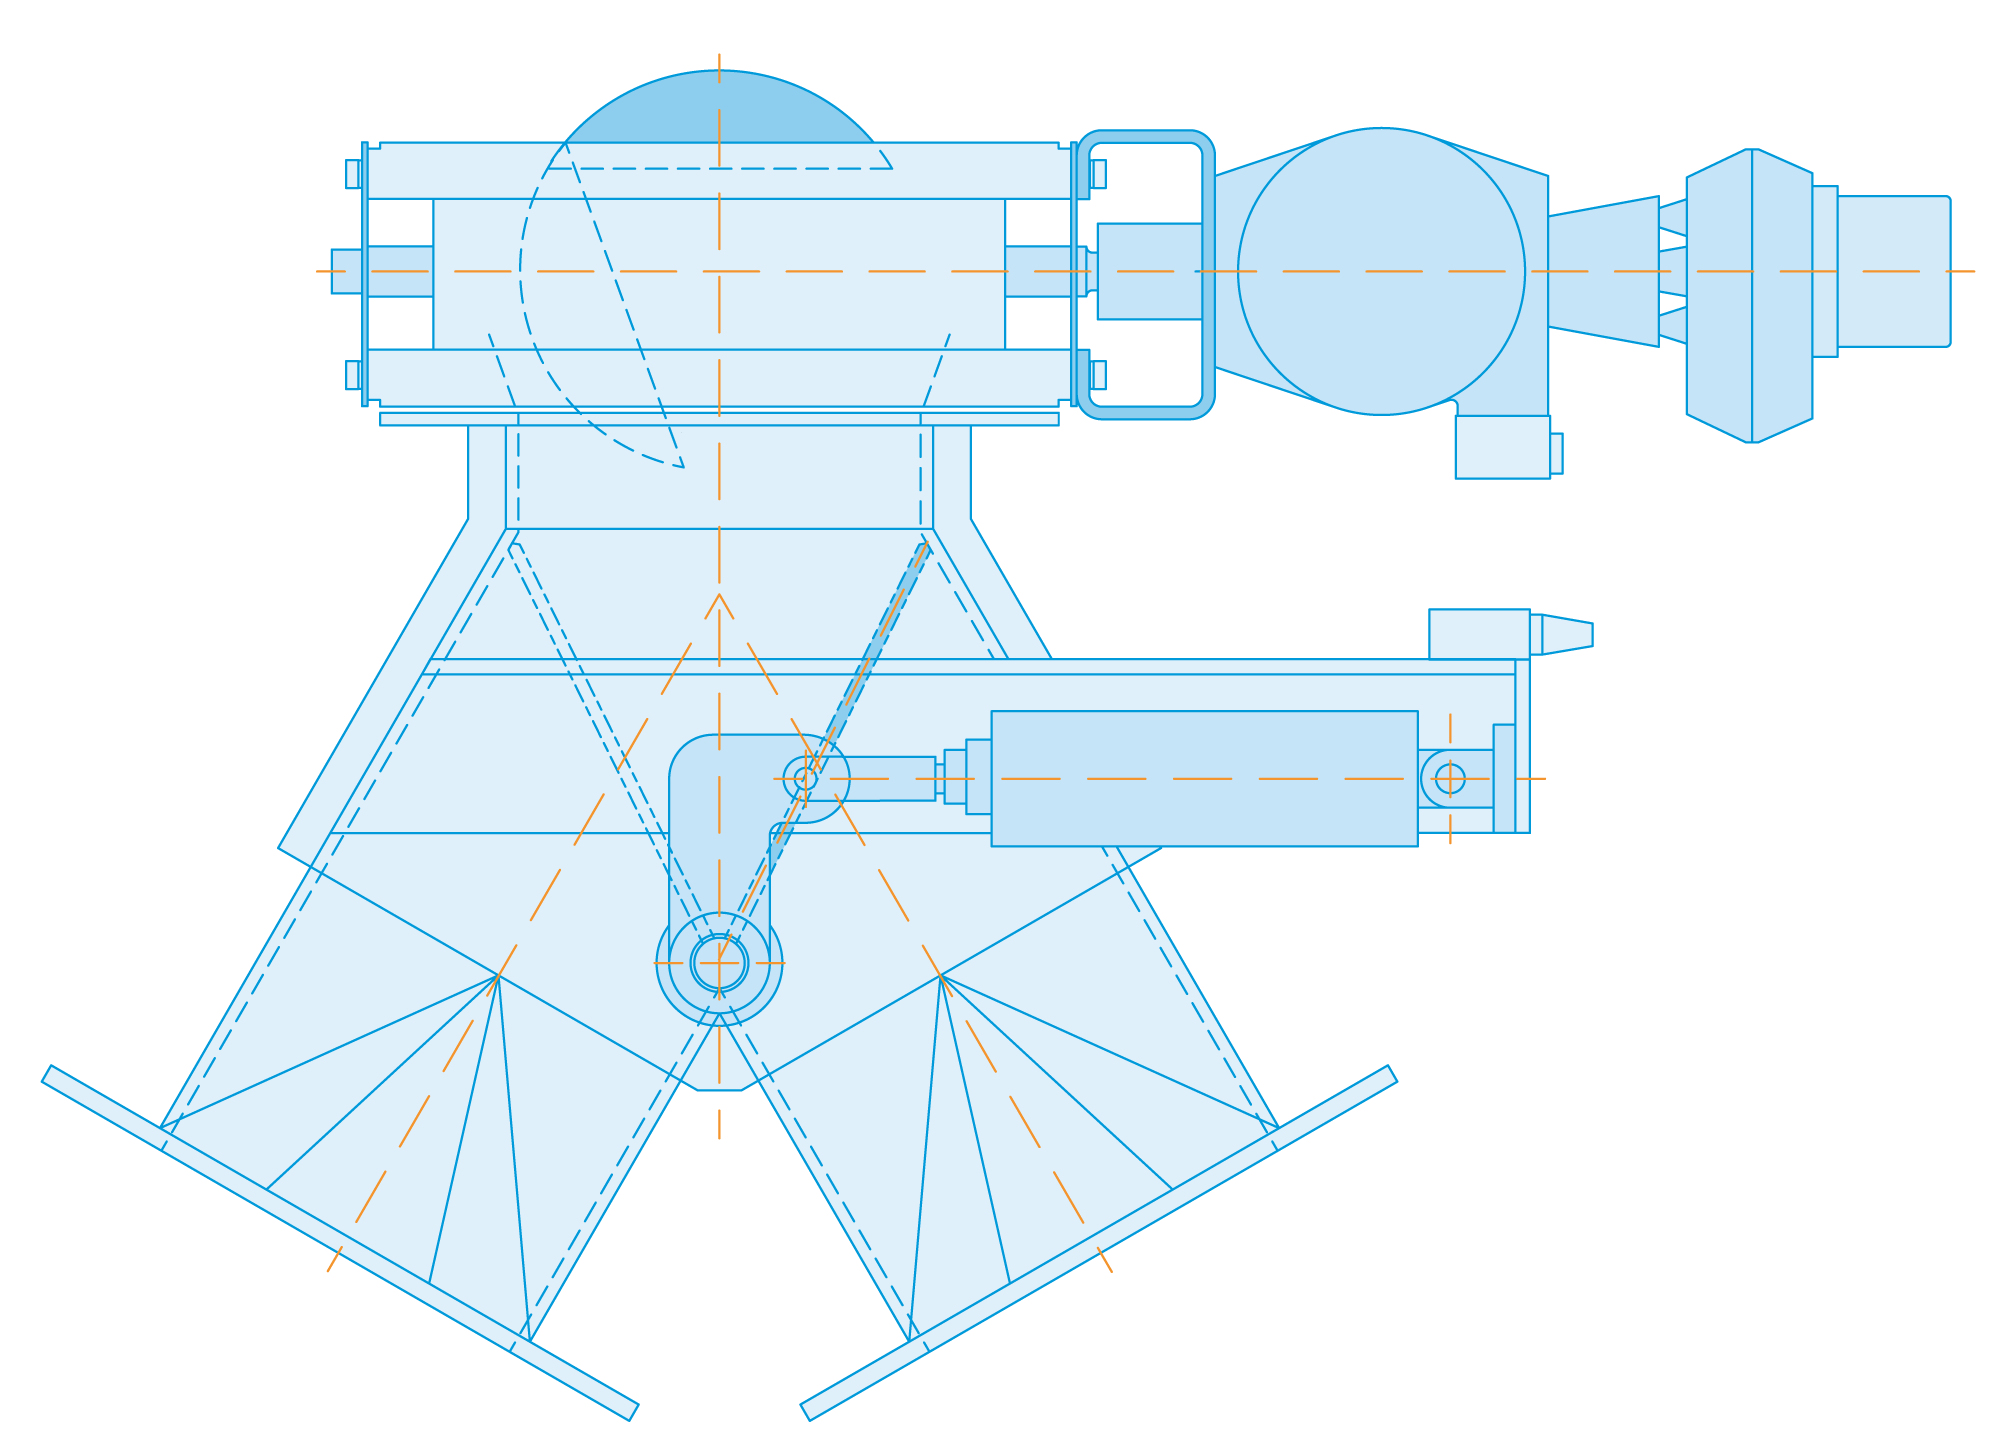 diverter product blue print diagram